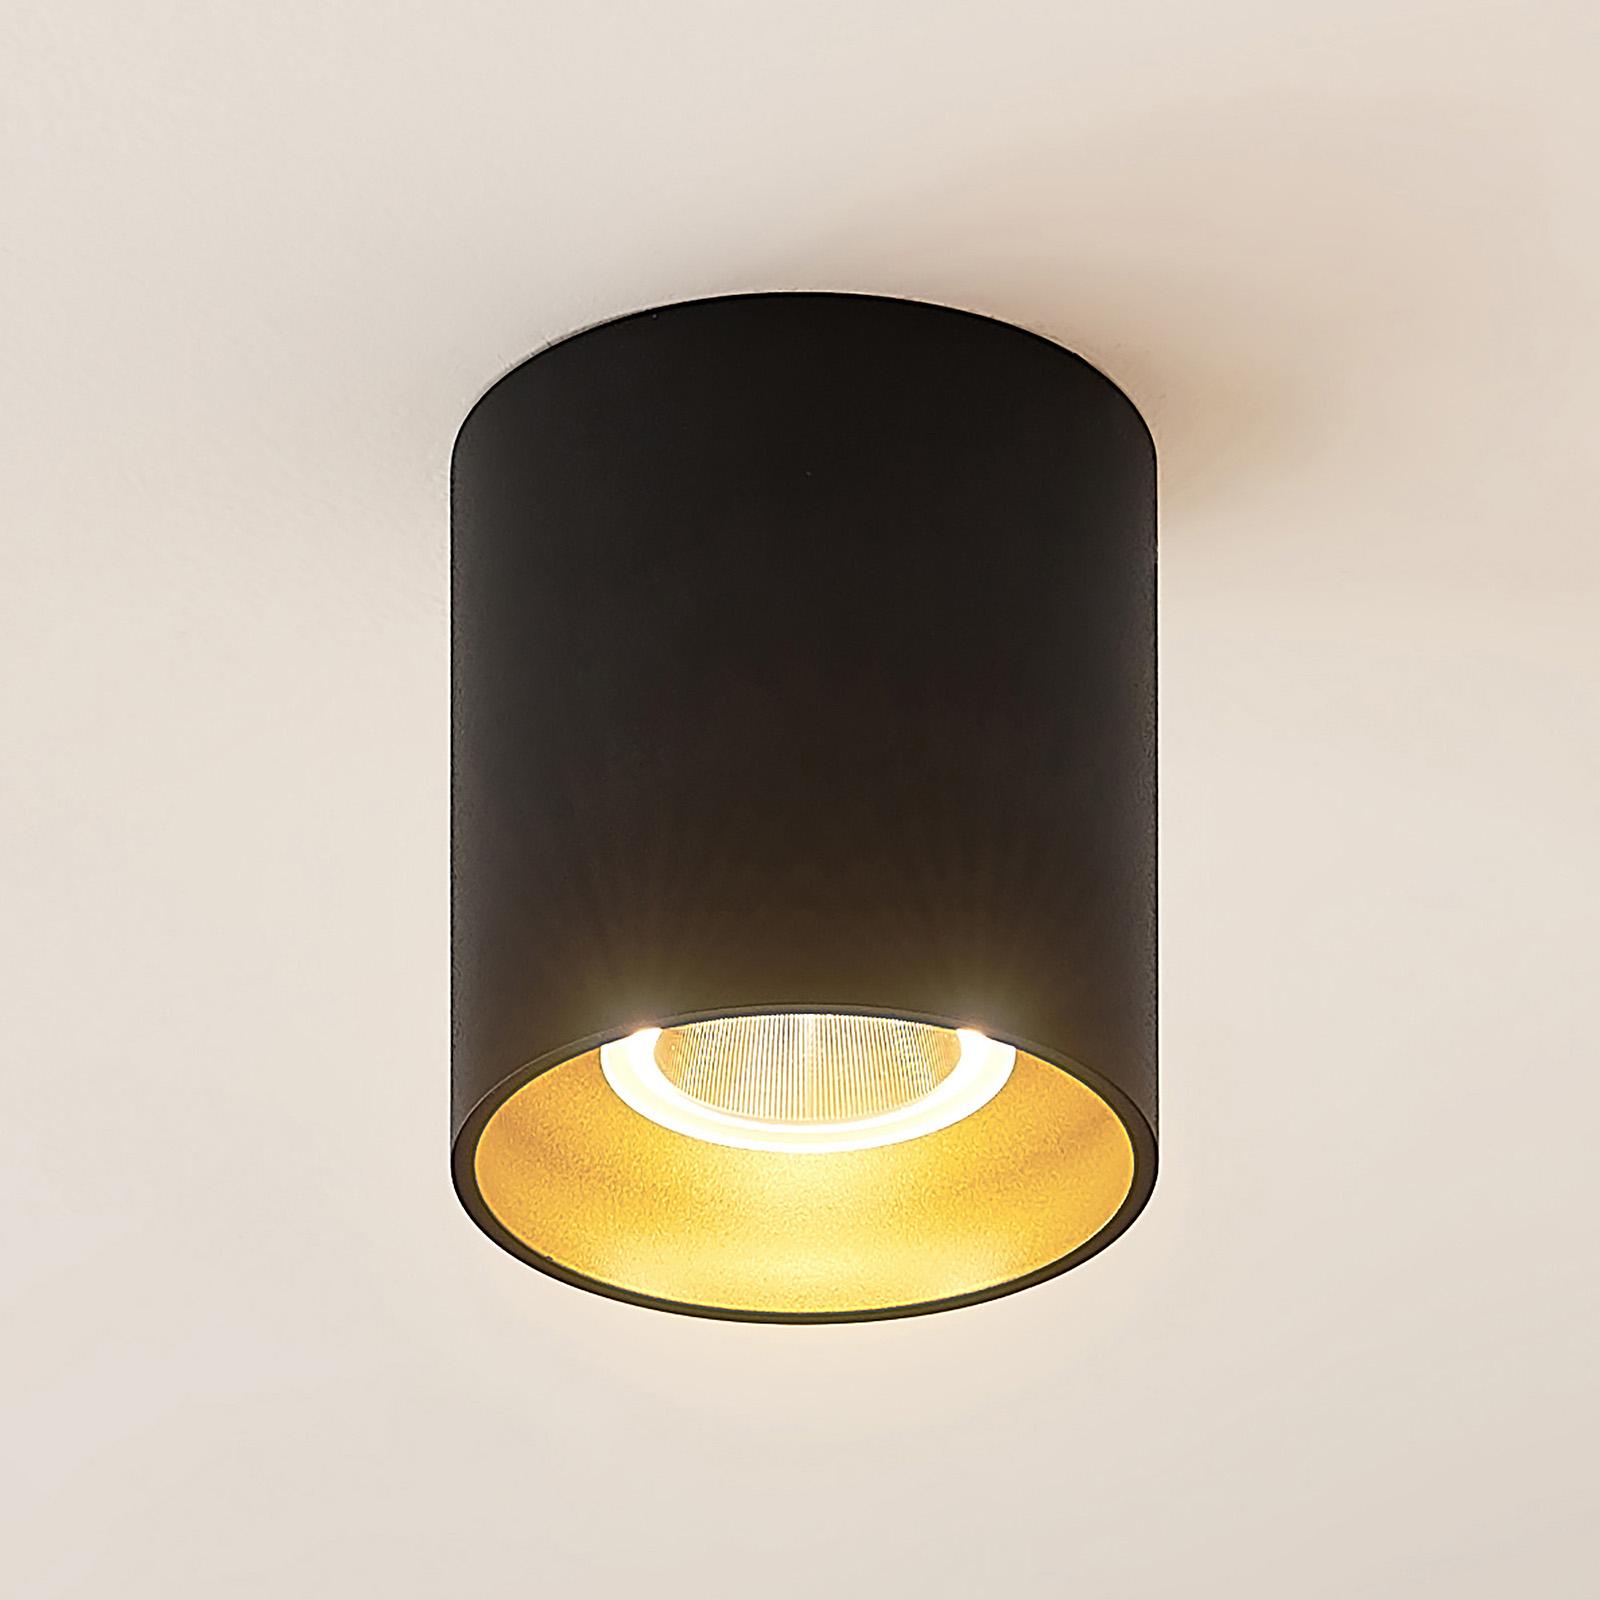 Arcchio Zaki LED-taklampe, rund, svart